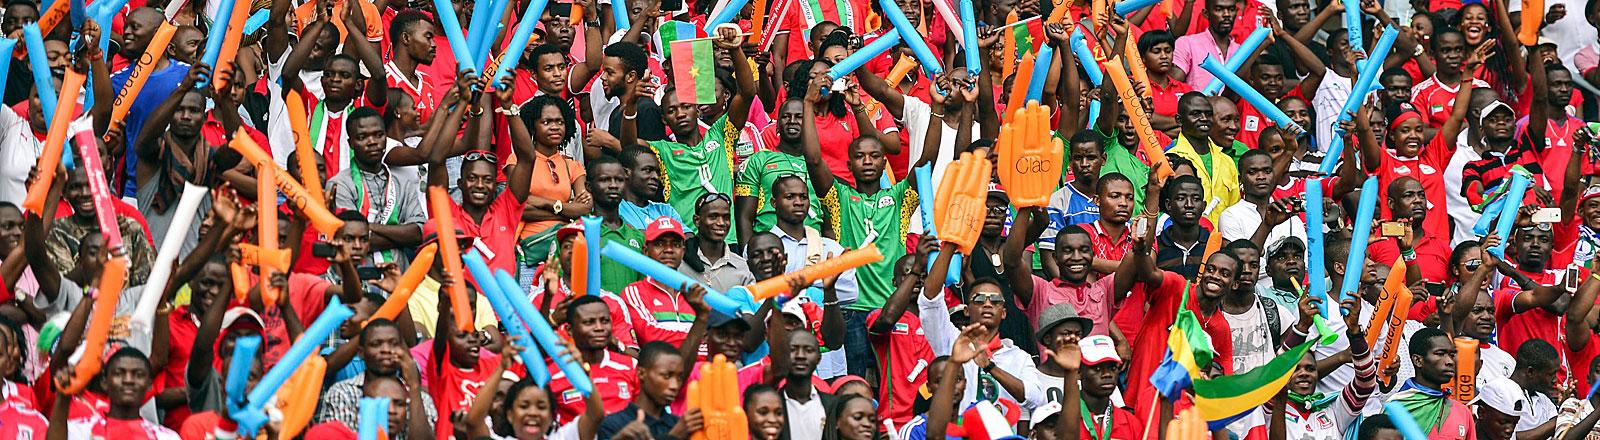 Fans bei der Eröffnungsfeier des Afrika Cup 2015 im Bata Stadion in Bata, Äquatorialguinea, am 17.01.2015